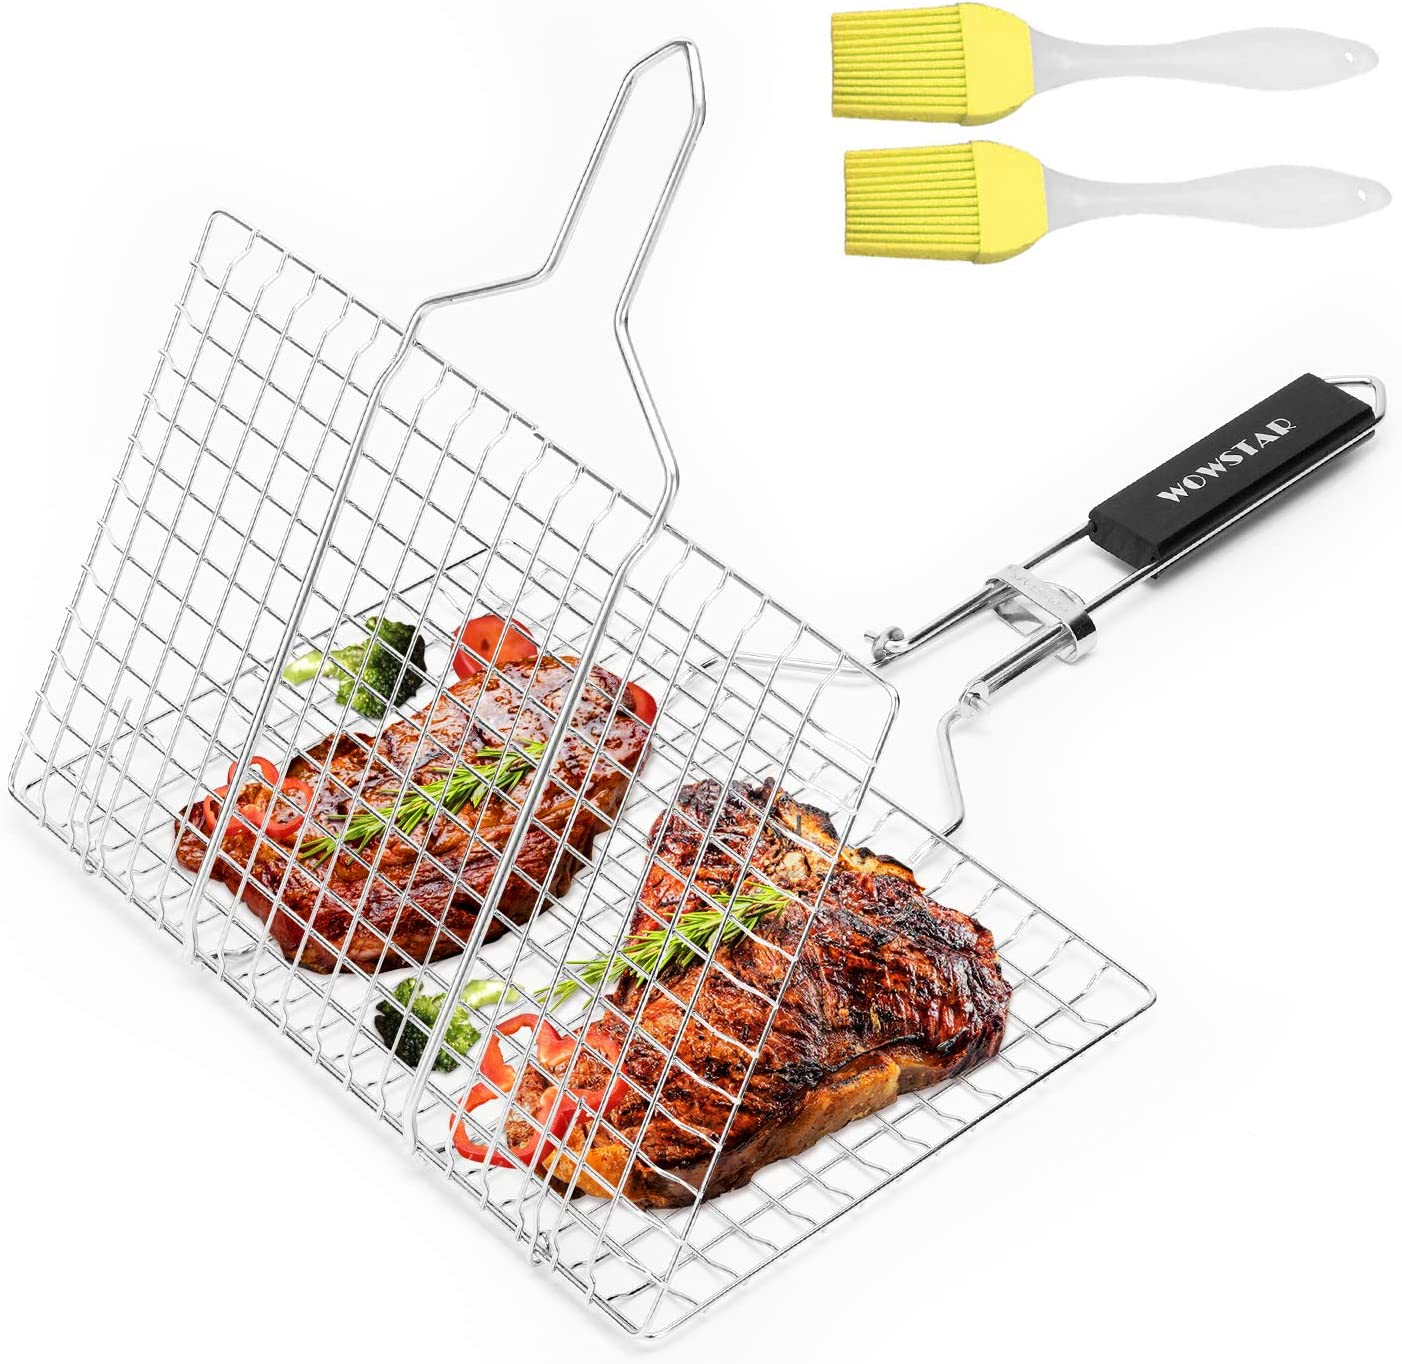 Florabest/® carbon stainless steel basket for indirect grilling.